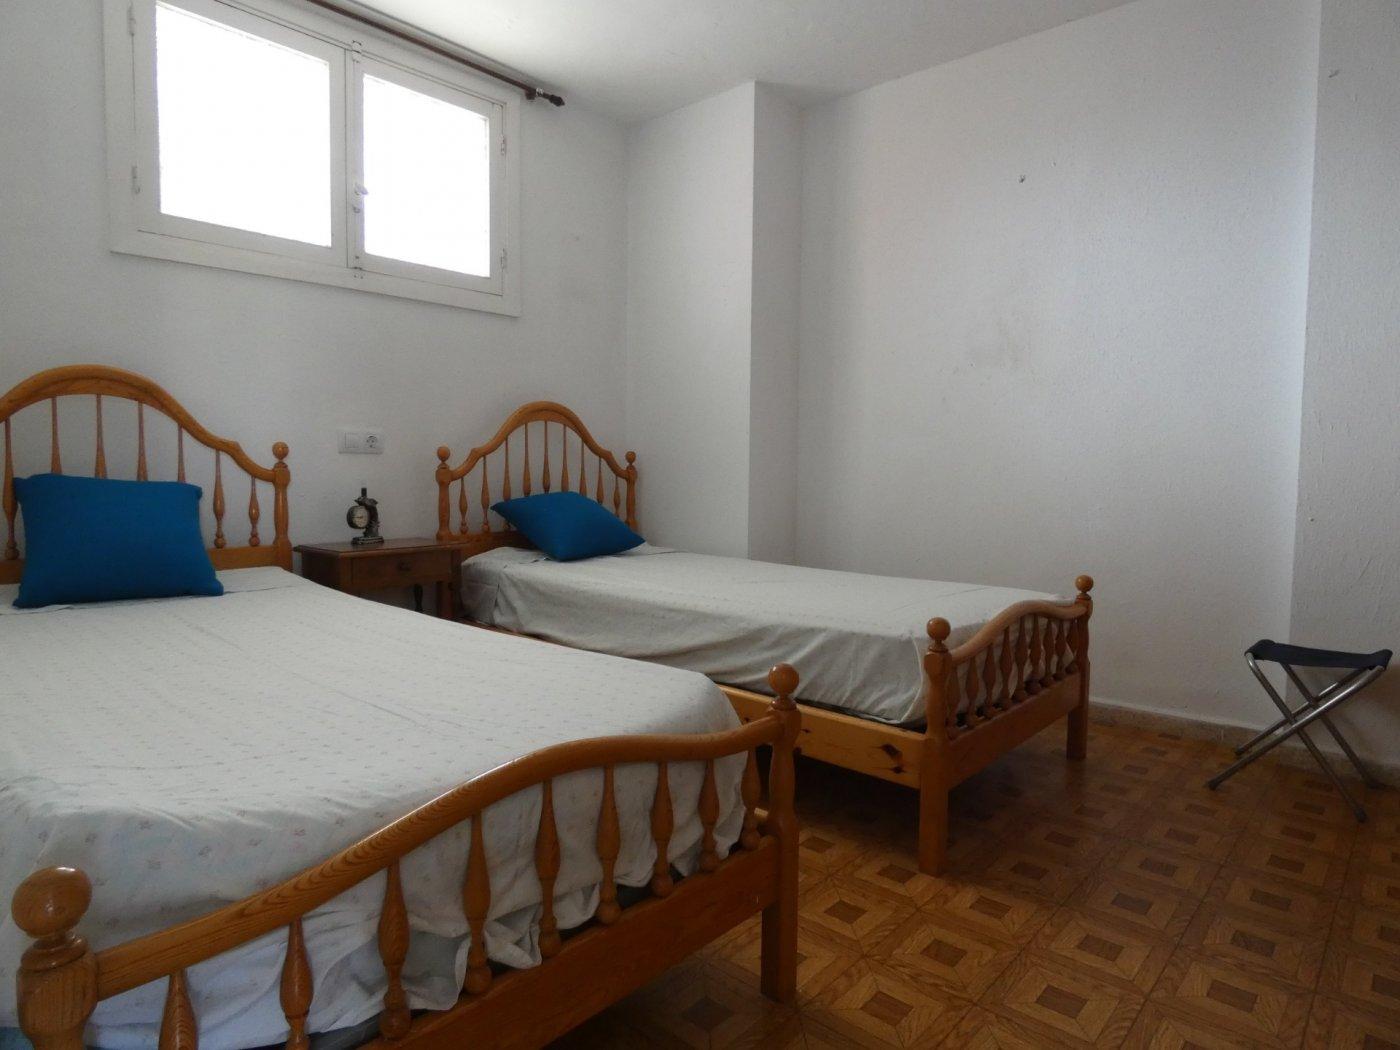 Maravilloso alquiler apartamento en son caliu!!!!! - imagenInmueble6